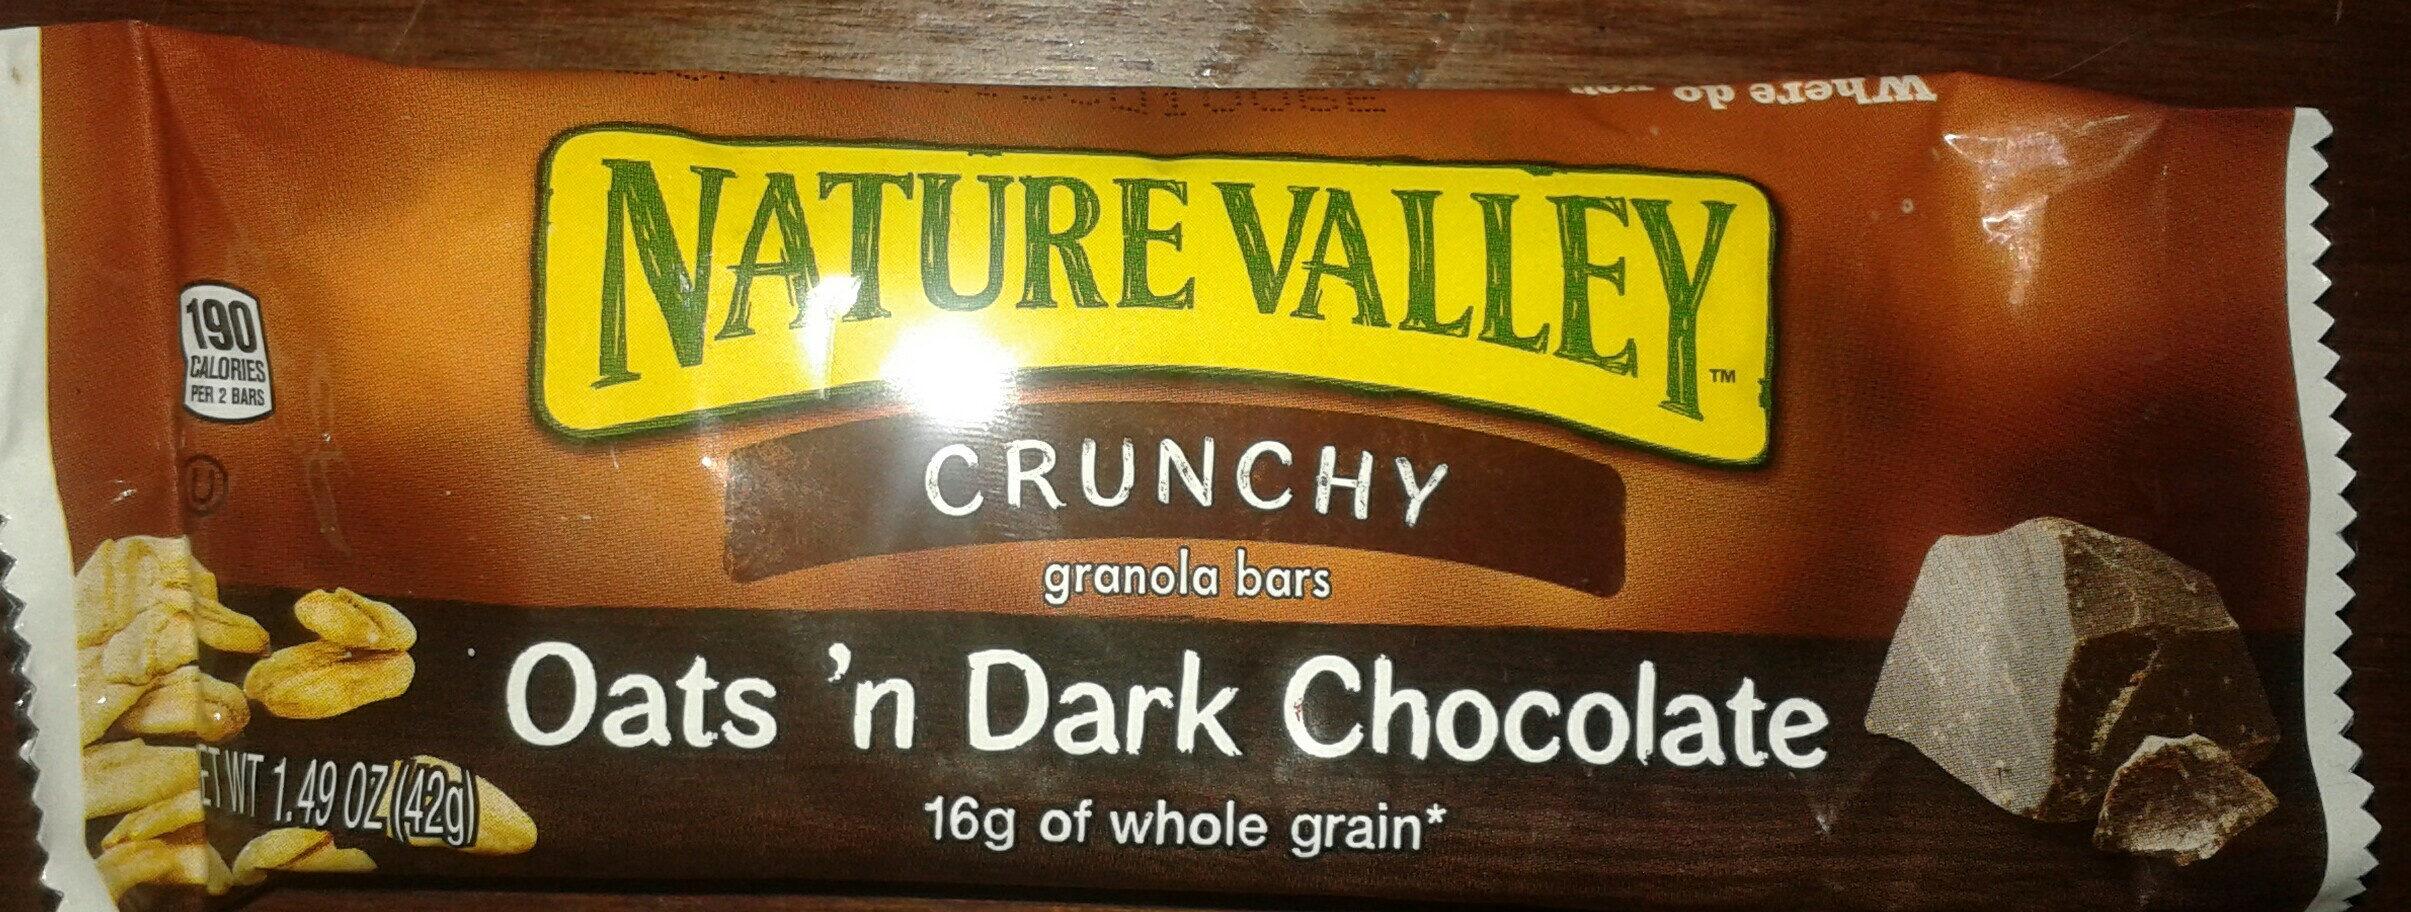 Nature Valley Crunchy Oats 'n Dark Chocolate Granola Bar - Produit - fr